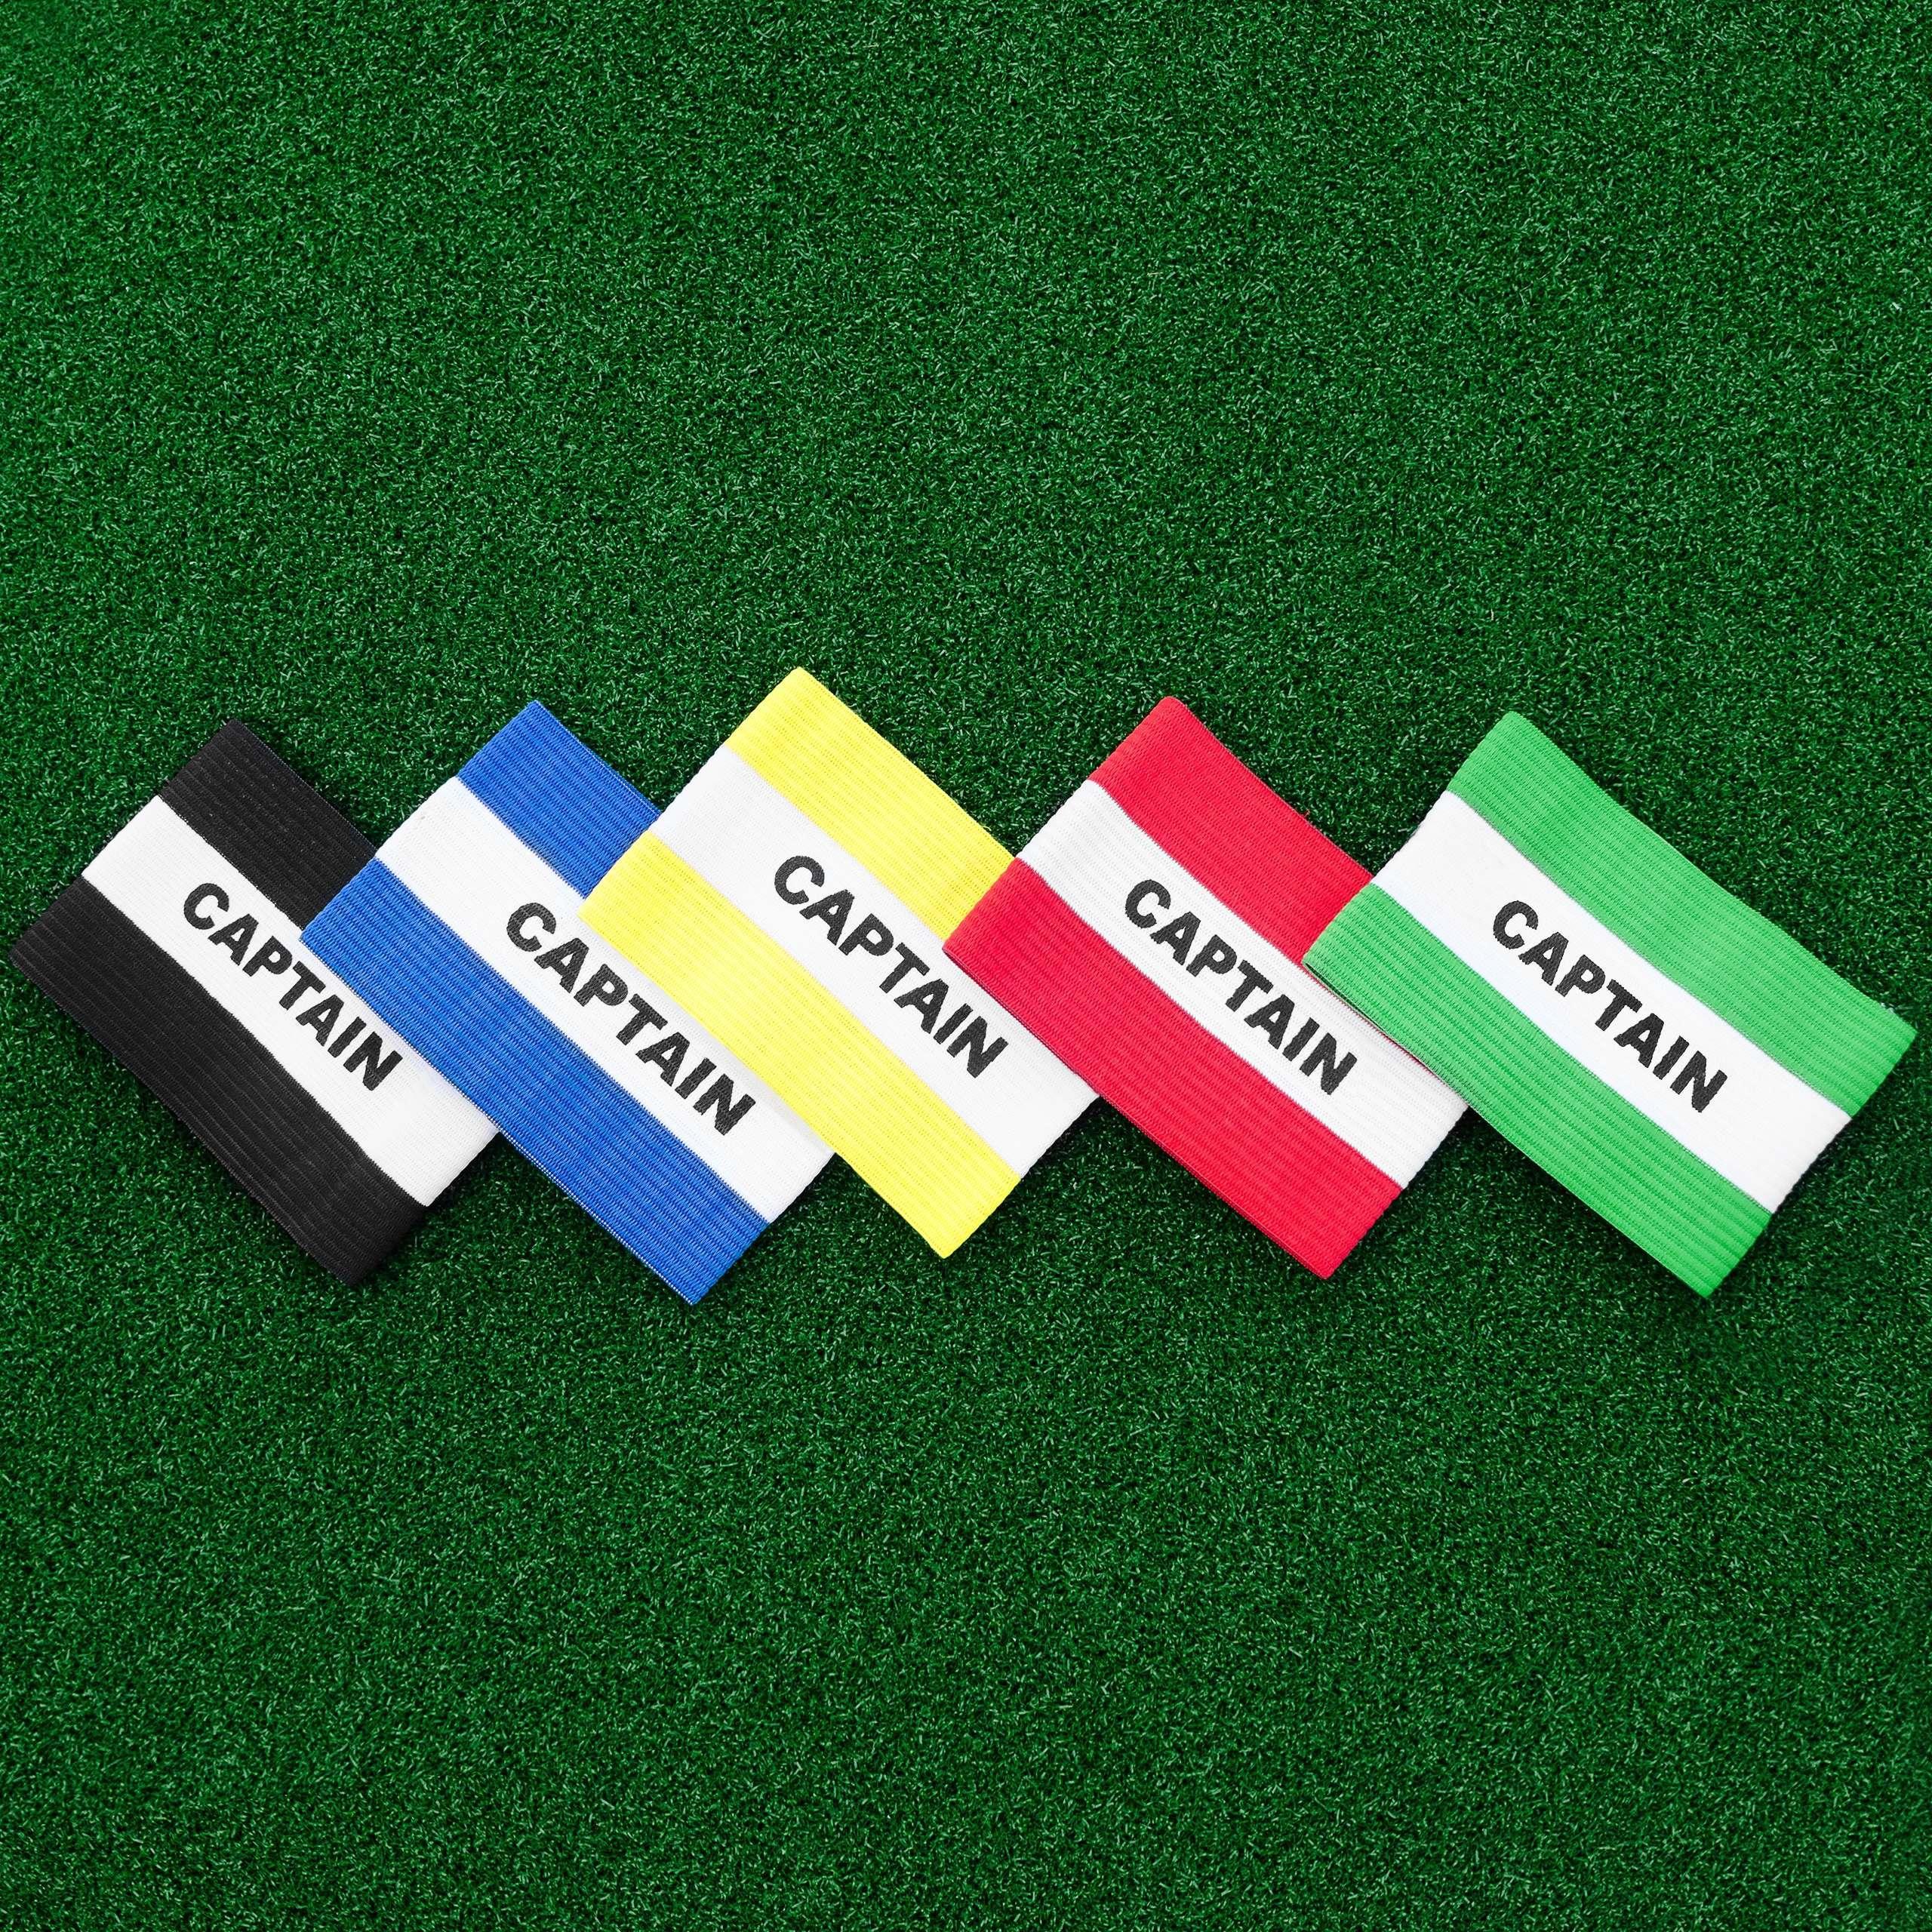 Soccer Team Captain's Armbands | Soccer Captain's Armbands (Range of Colors)